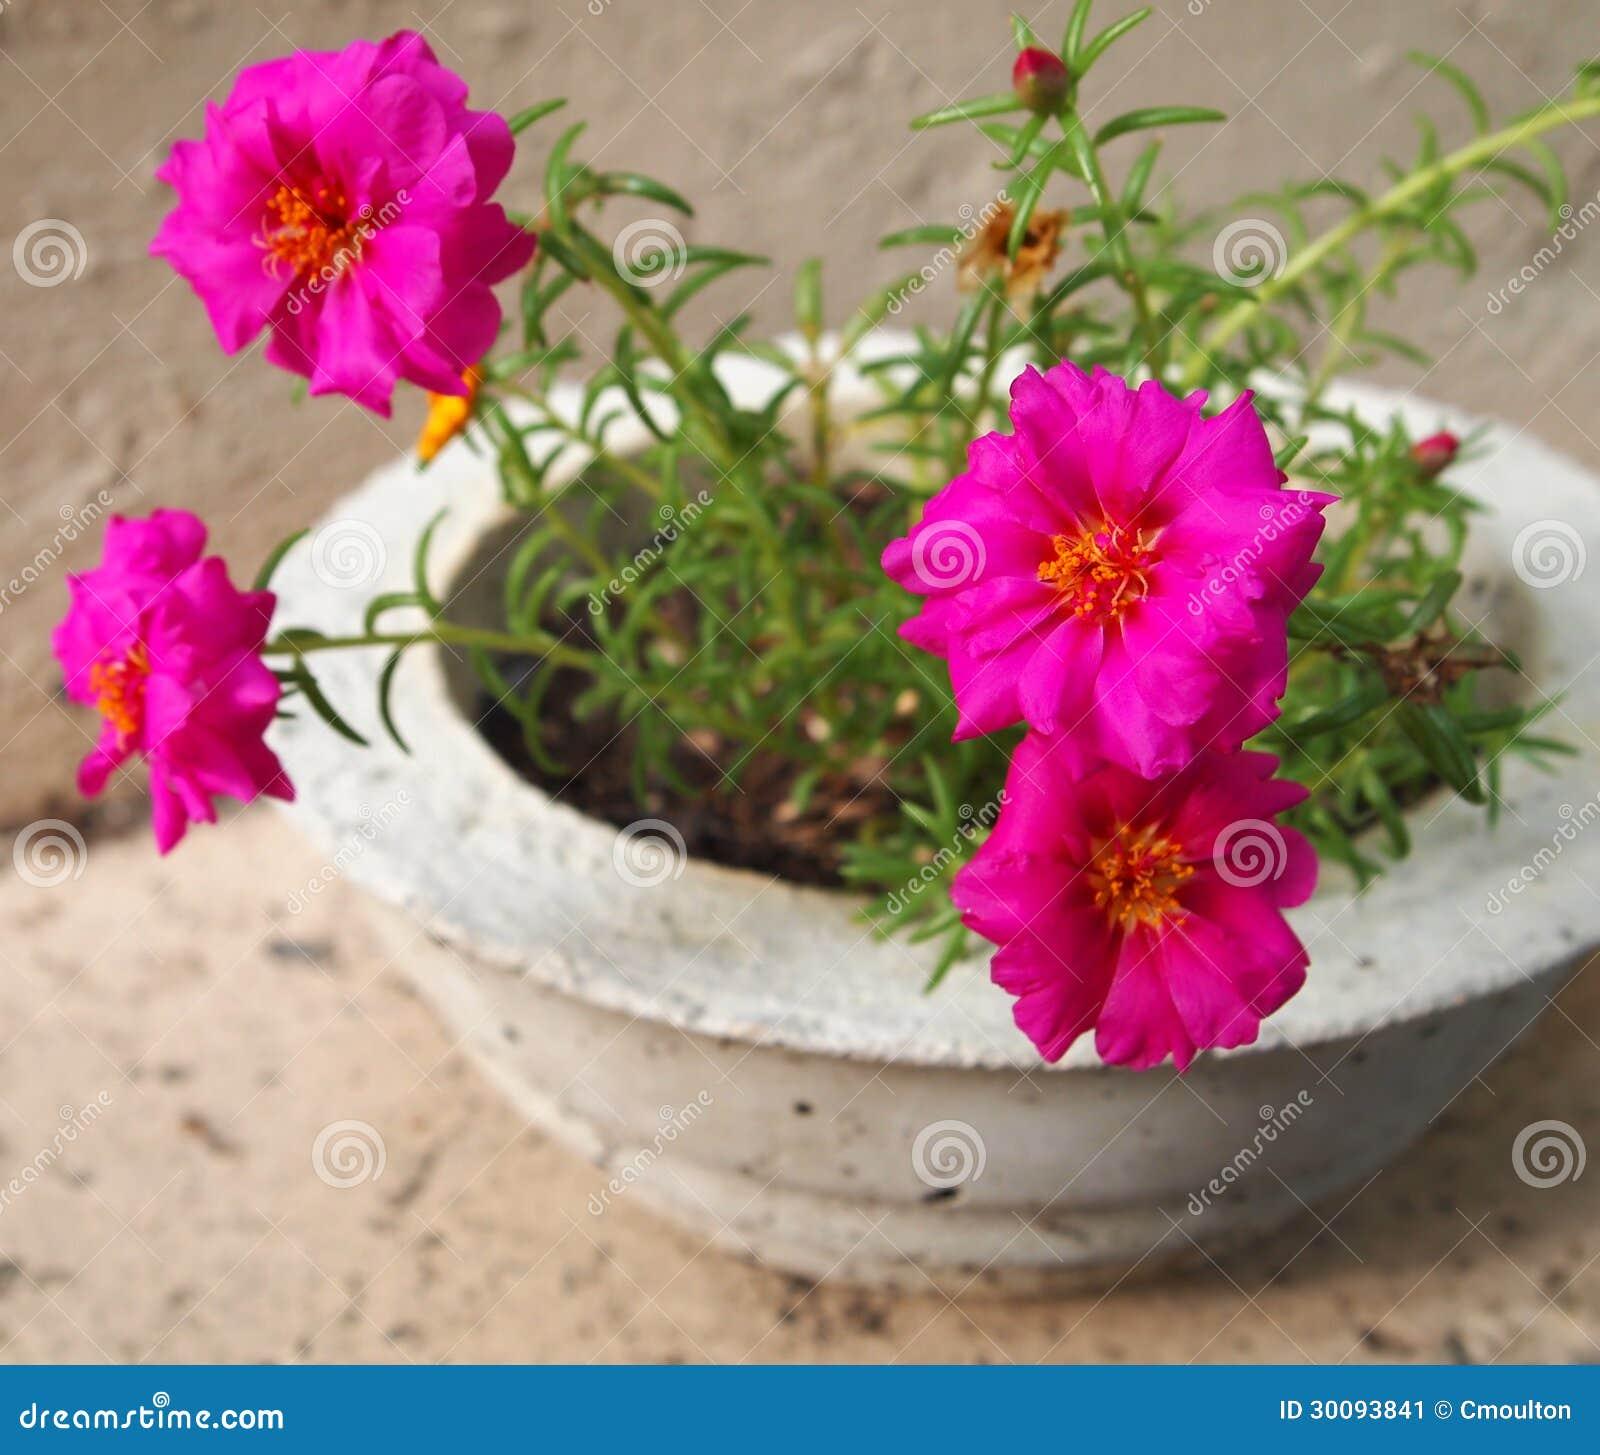 portulaca flowers in concrete pot stock image image 30093841